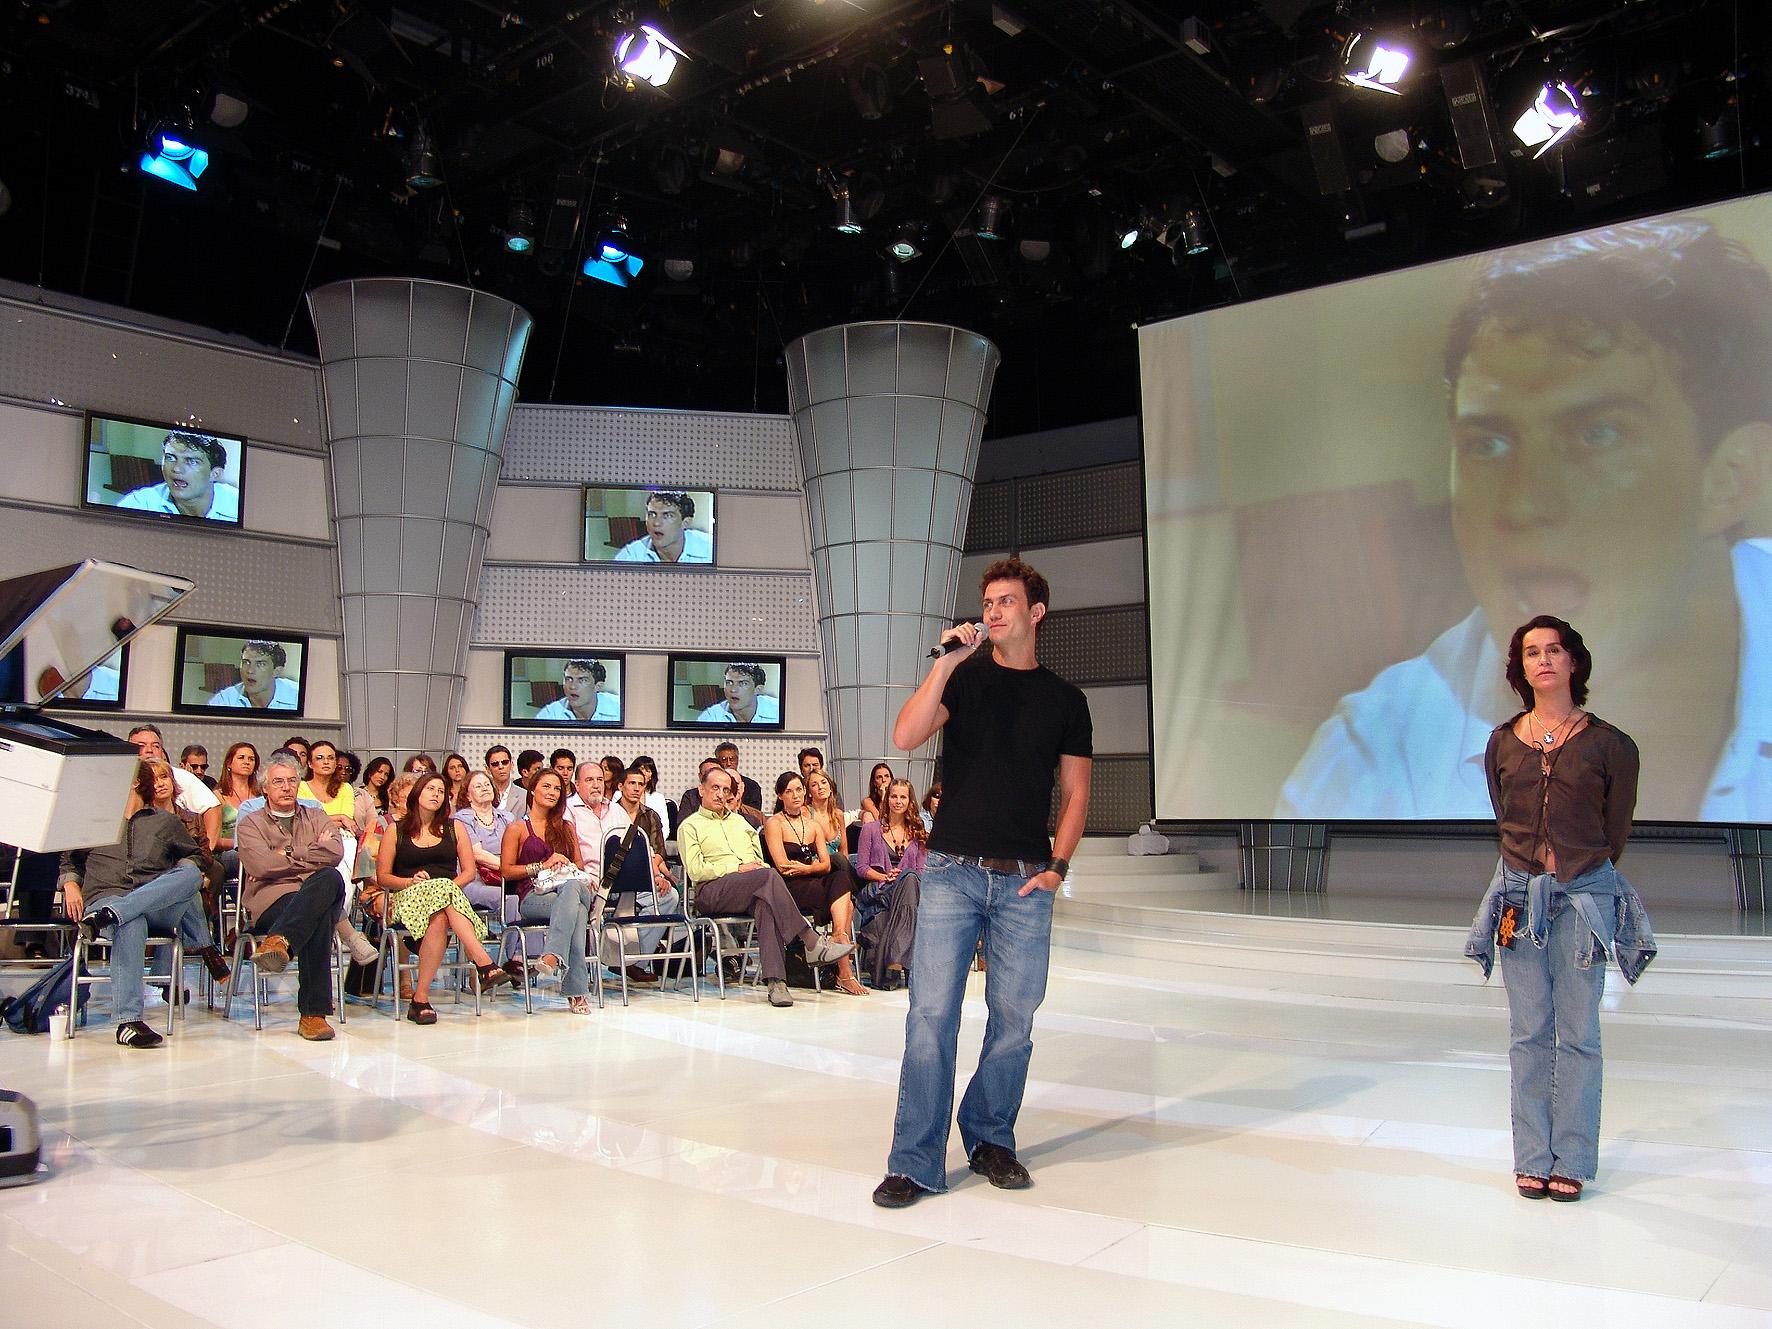 http://upload.wikimedia.org/wikipedia/commons/d/d0/Gabriel_Braga_Nunes_e_Lucelia_Santos.jpg